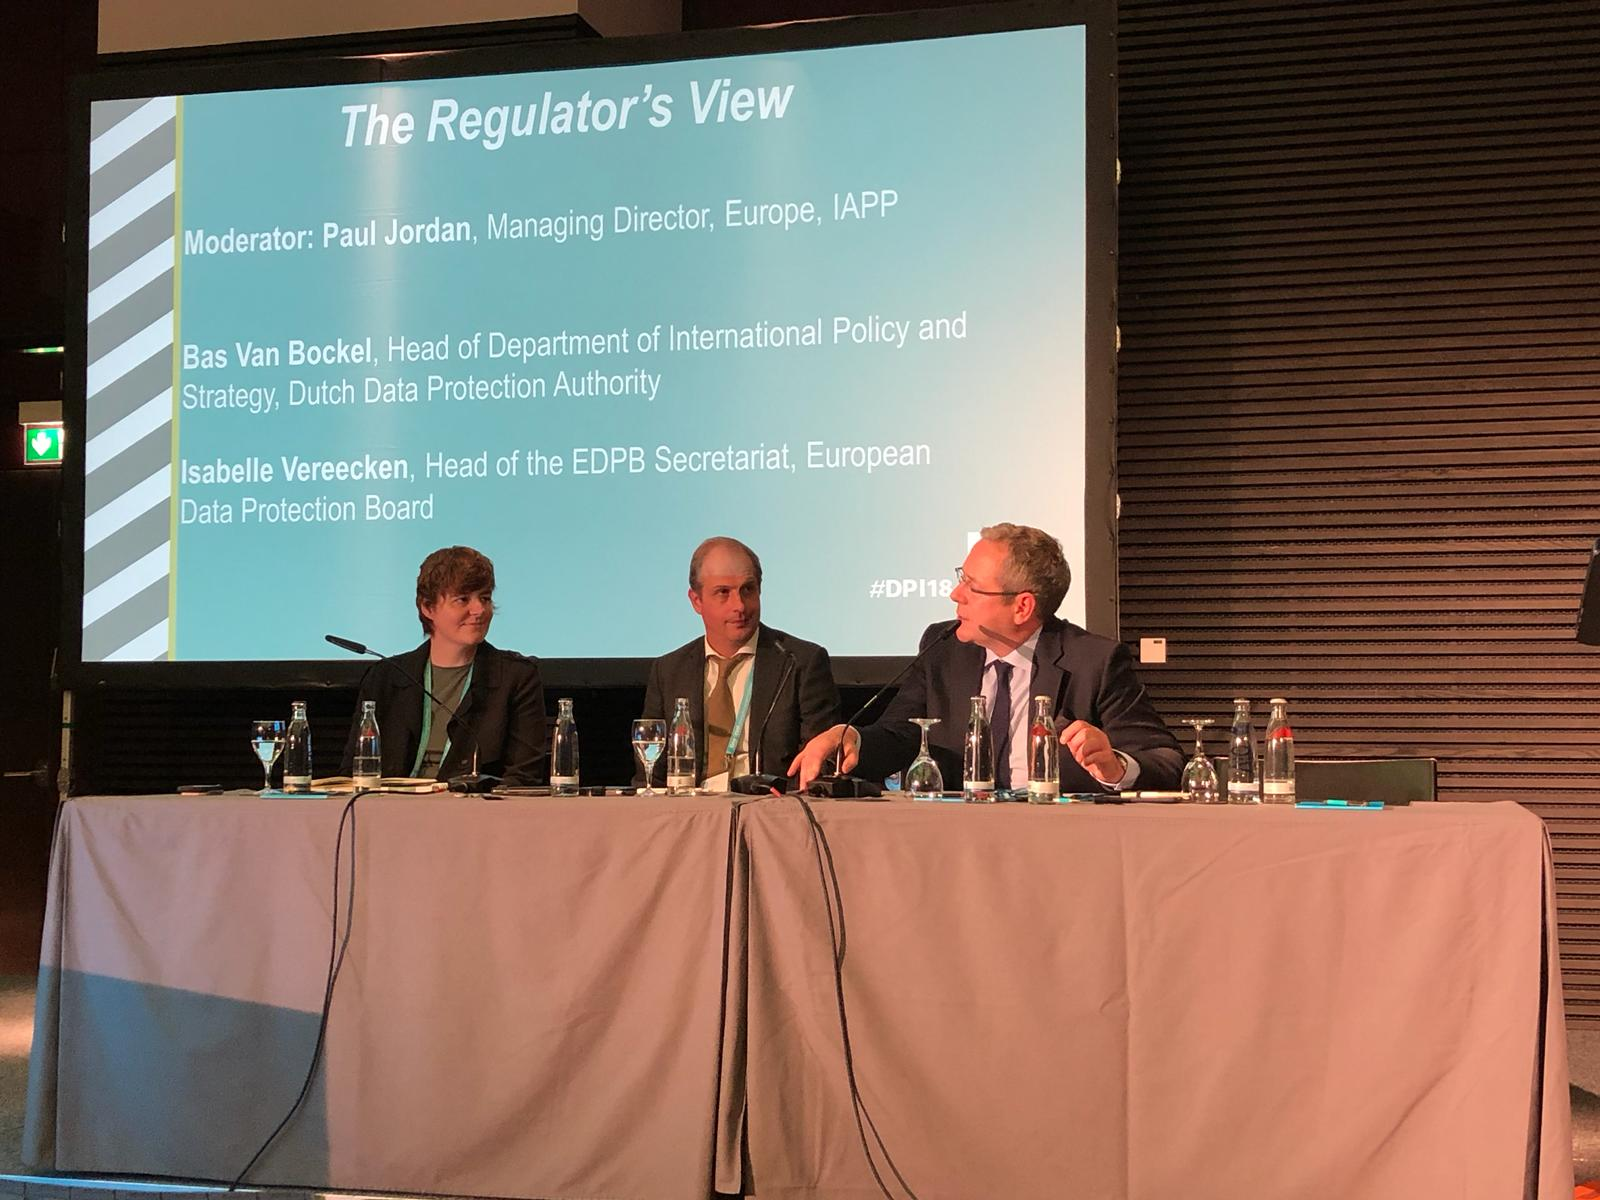 EDPB secretariat, Dutch DPA foreshadow EDPB plenary